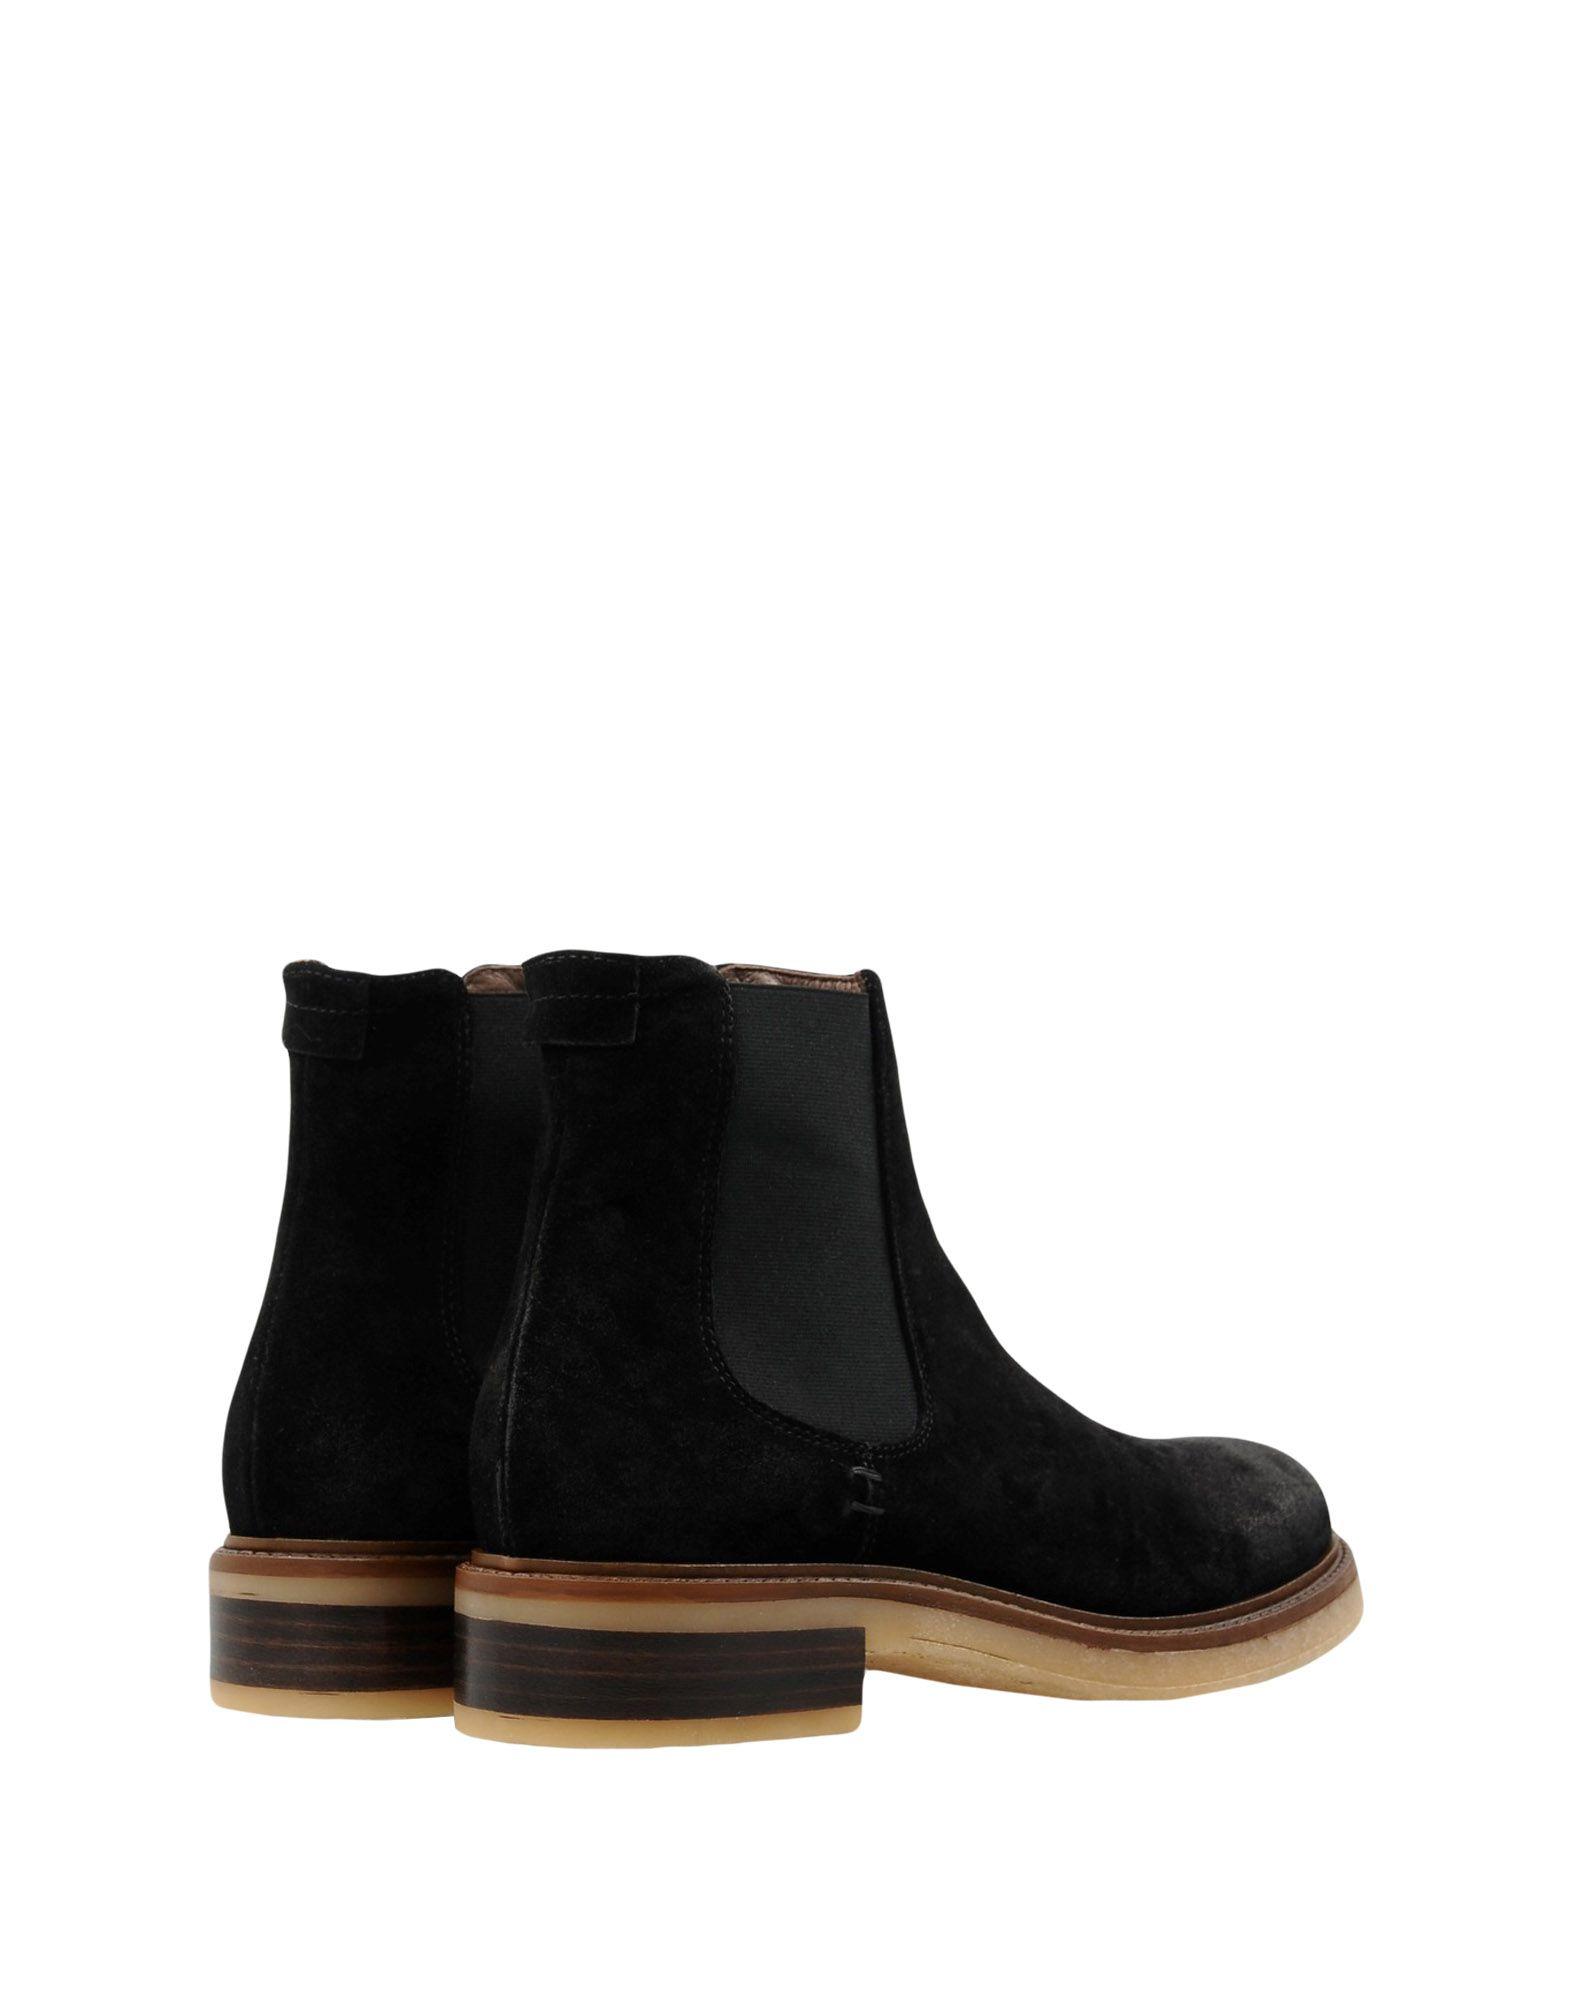 Gut Chelsea um billige Schuhe zu tragenLeonardo Principi Chelsea Gut Boots Damen  11317457SR 1e2061